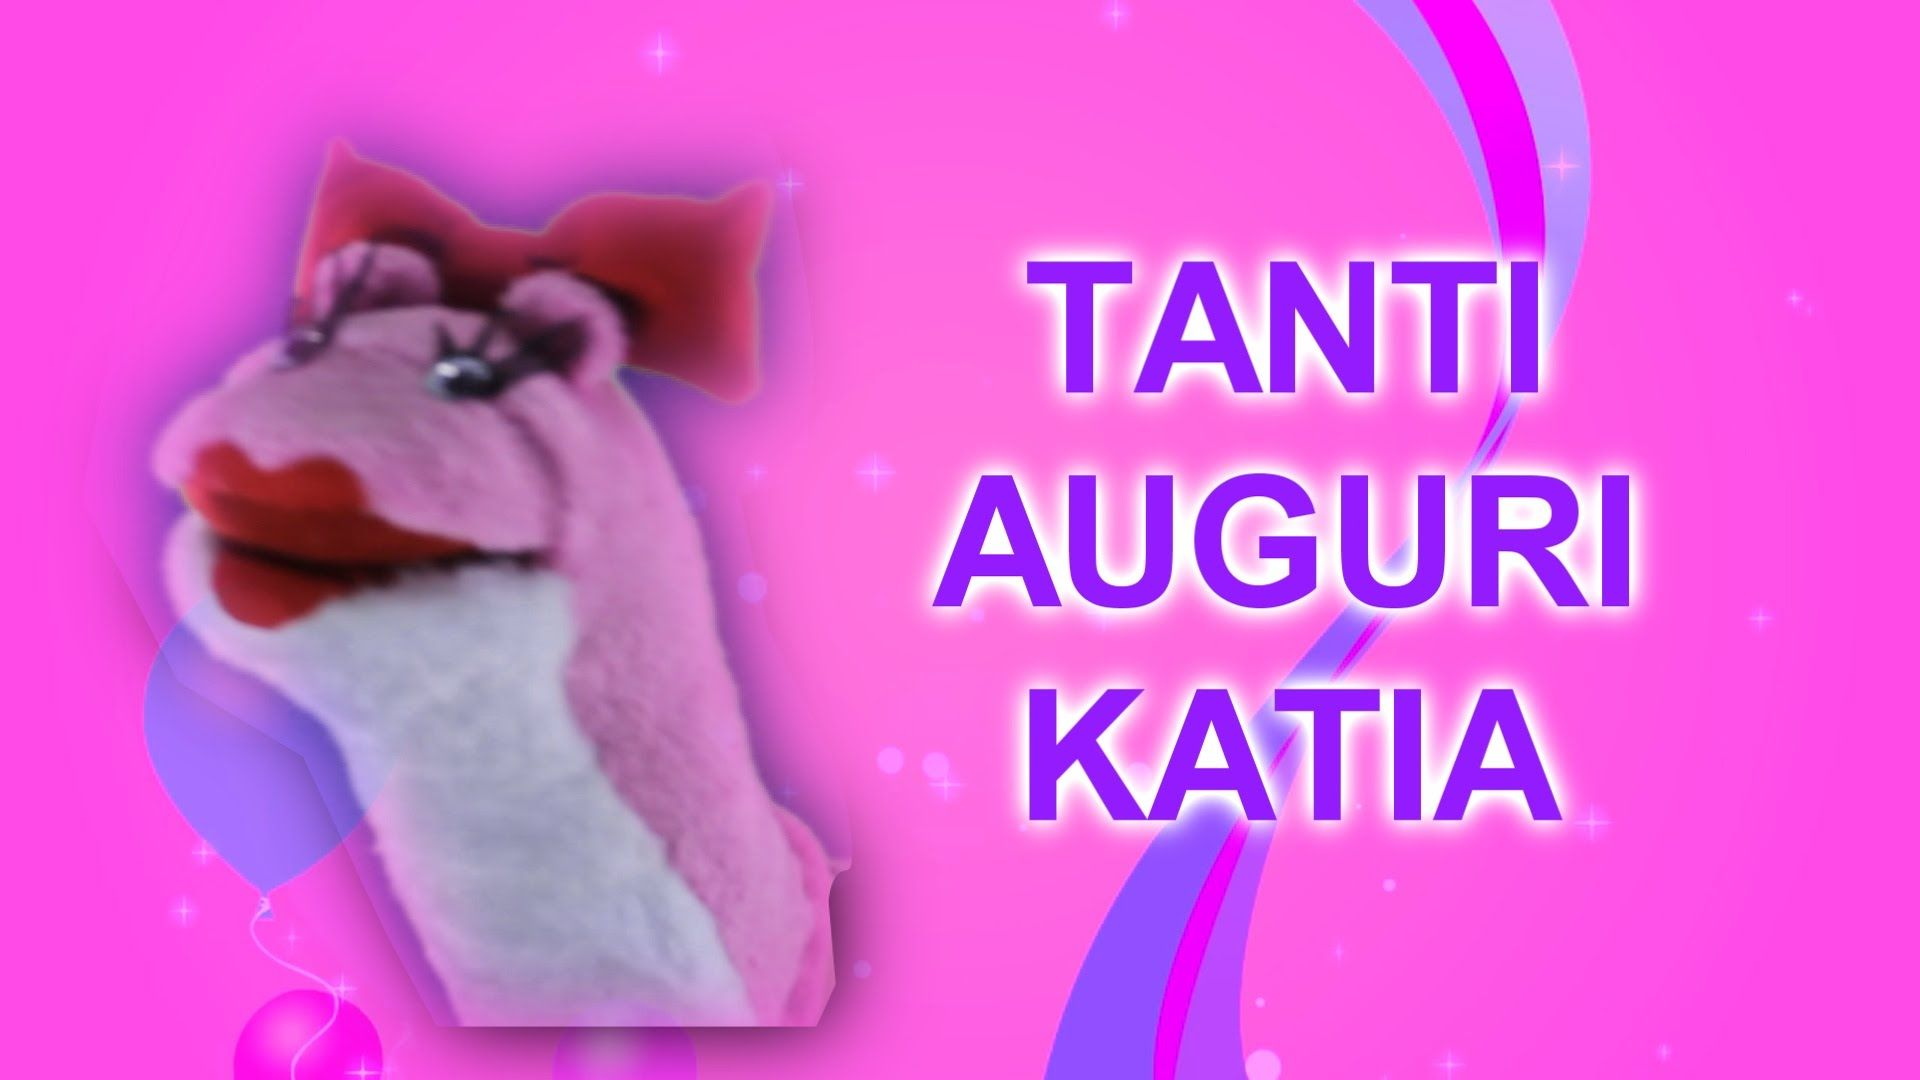 Tanti Auguri Katia | Tanti Auguri | Christmas Ornaments, Christmas